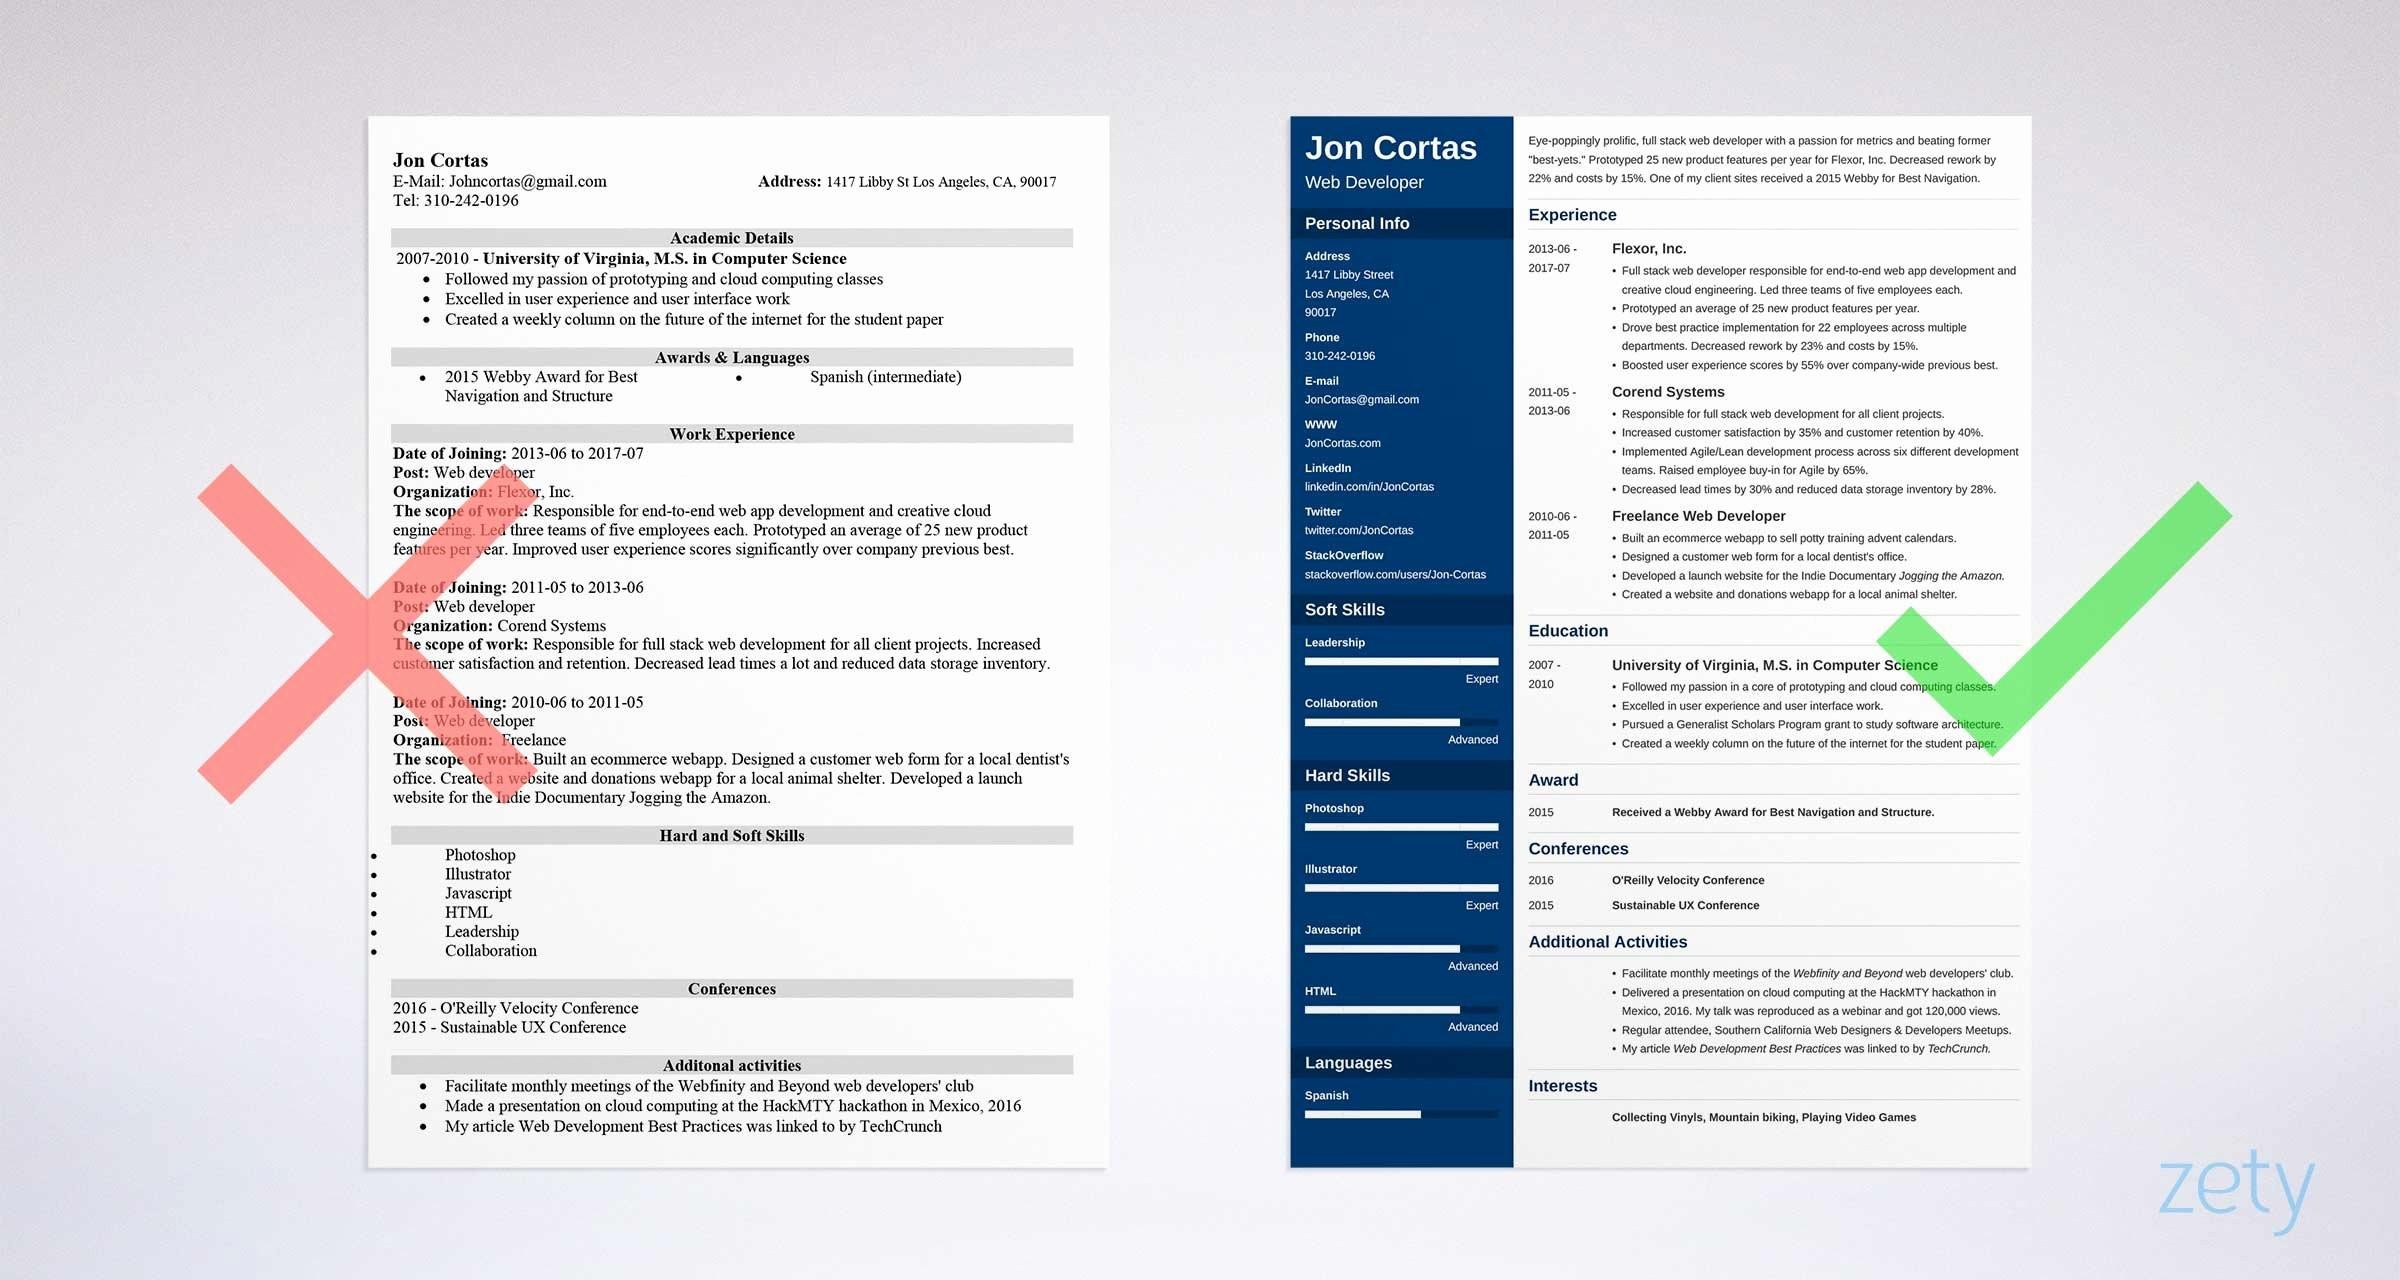 Free Curriculum Vitae Template Word Elegant Resume Templates Word 15 Free Cv Resume formats to Download